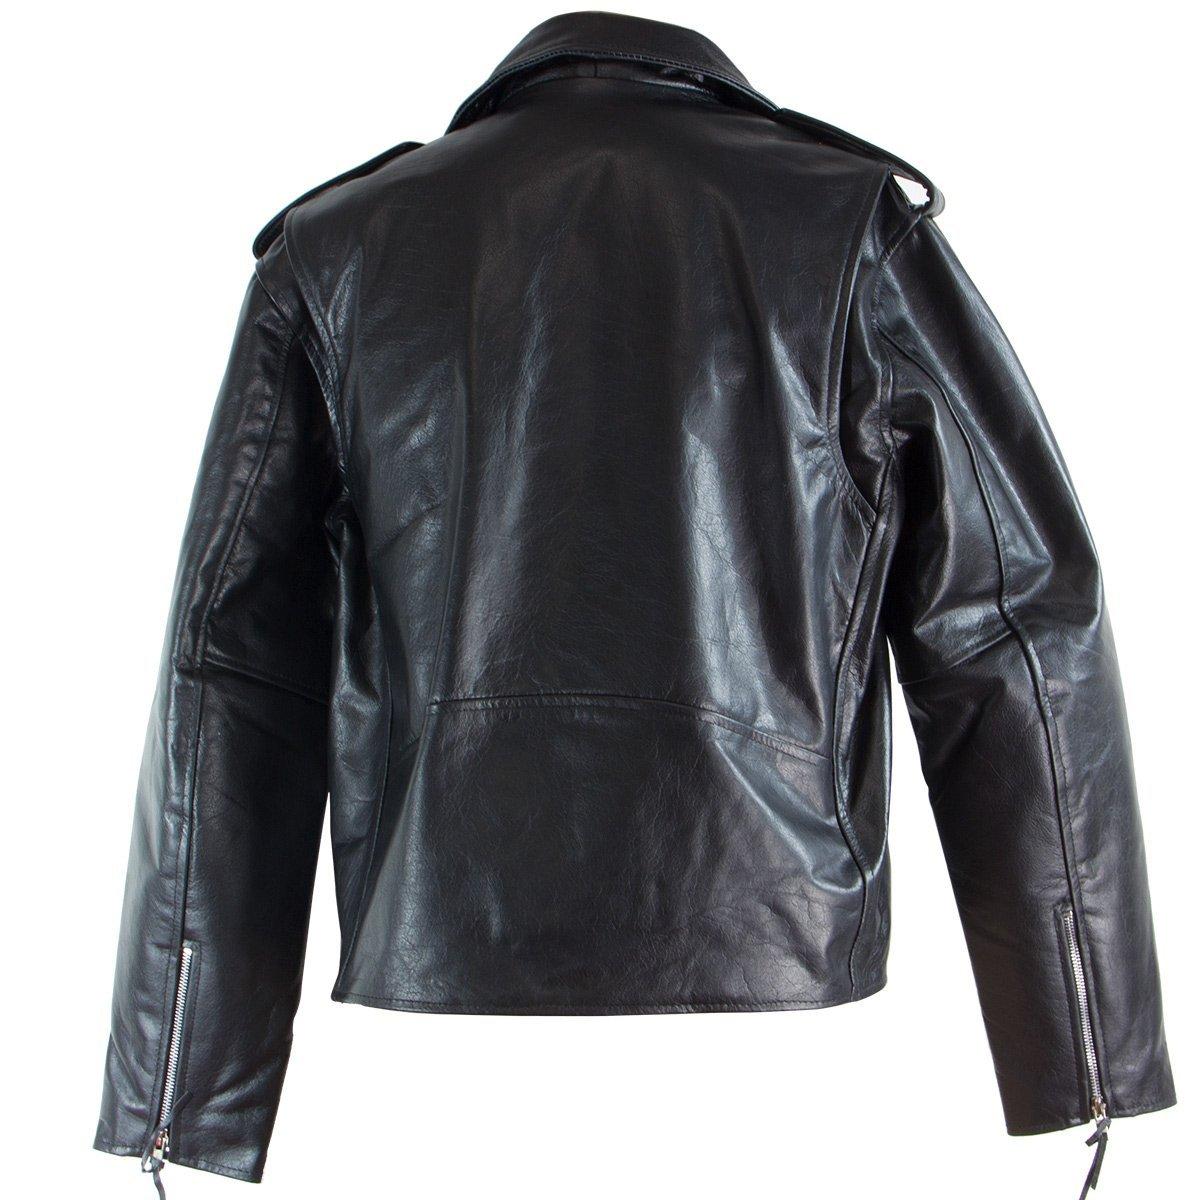 Black TOP GRADE Leather Motorcycle Biker Jacket 5